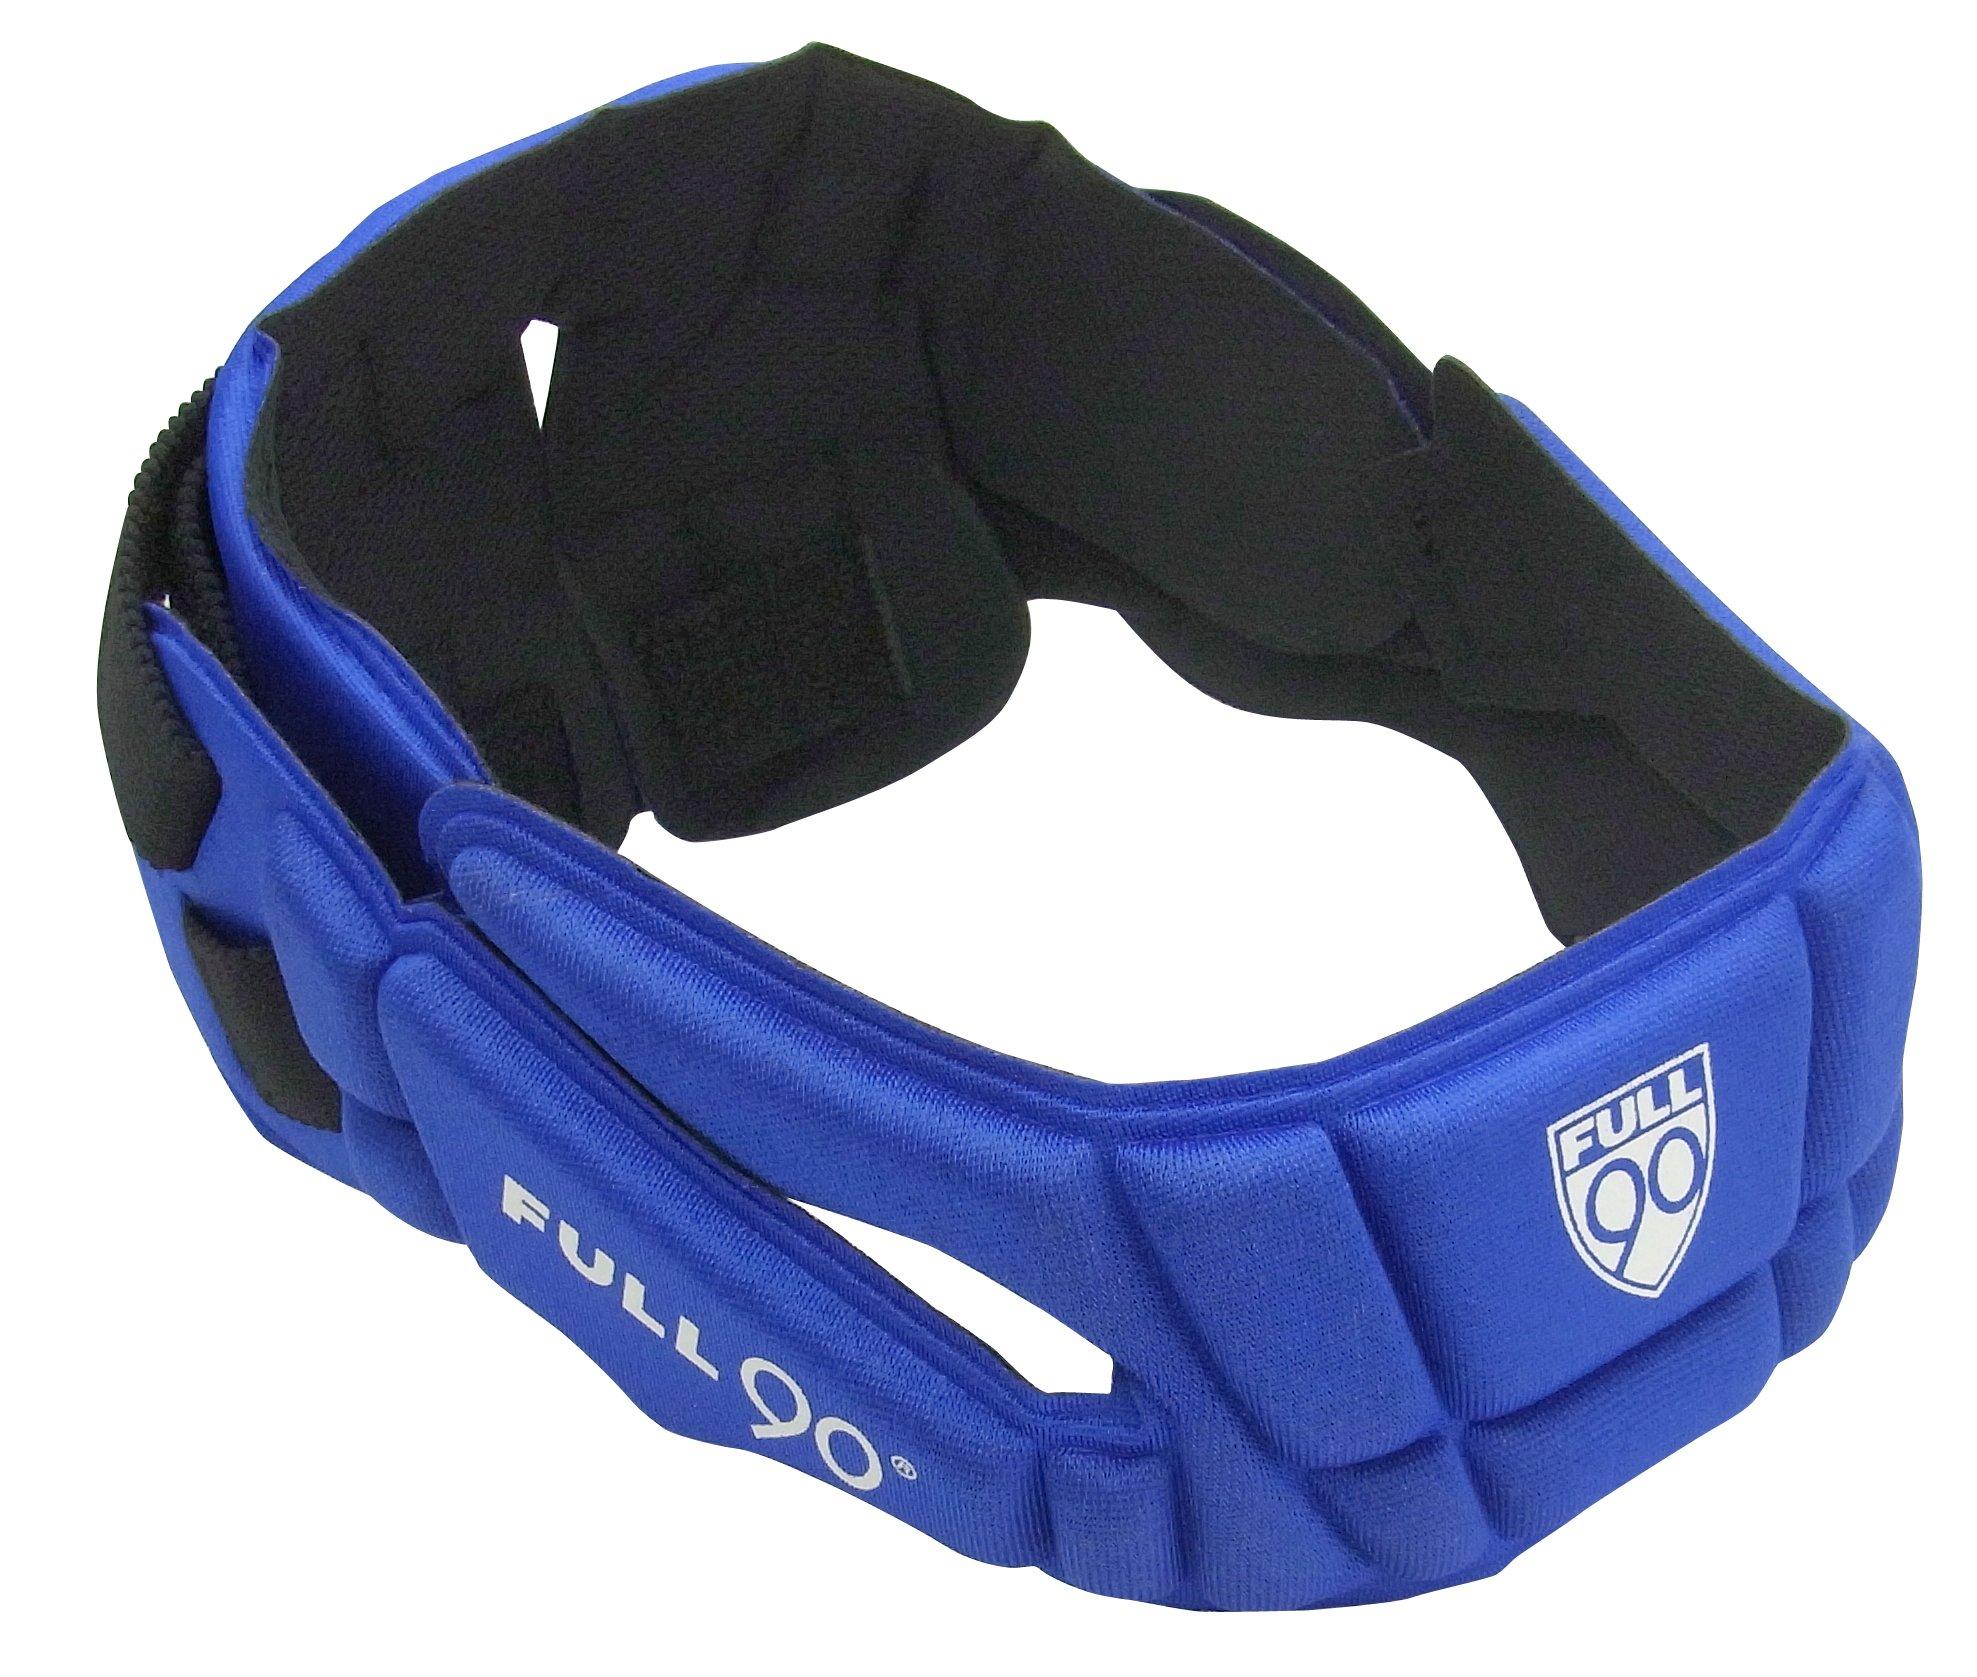 Full 90 Sports PREMIER Performance Soccer Headgear, Royal, Small/Medium